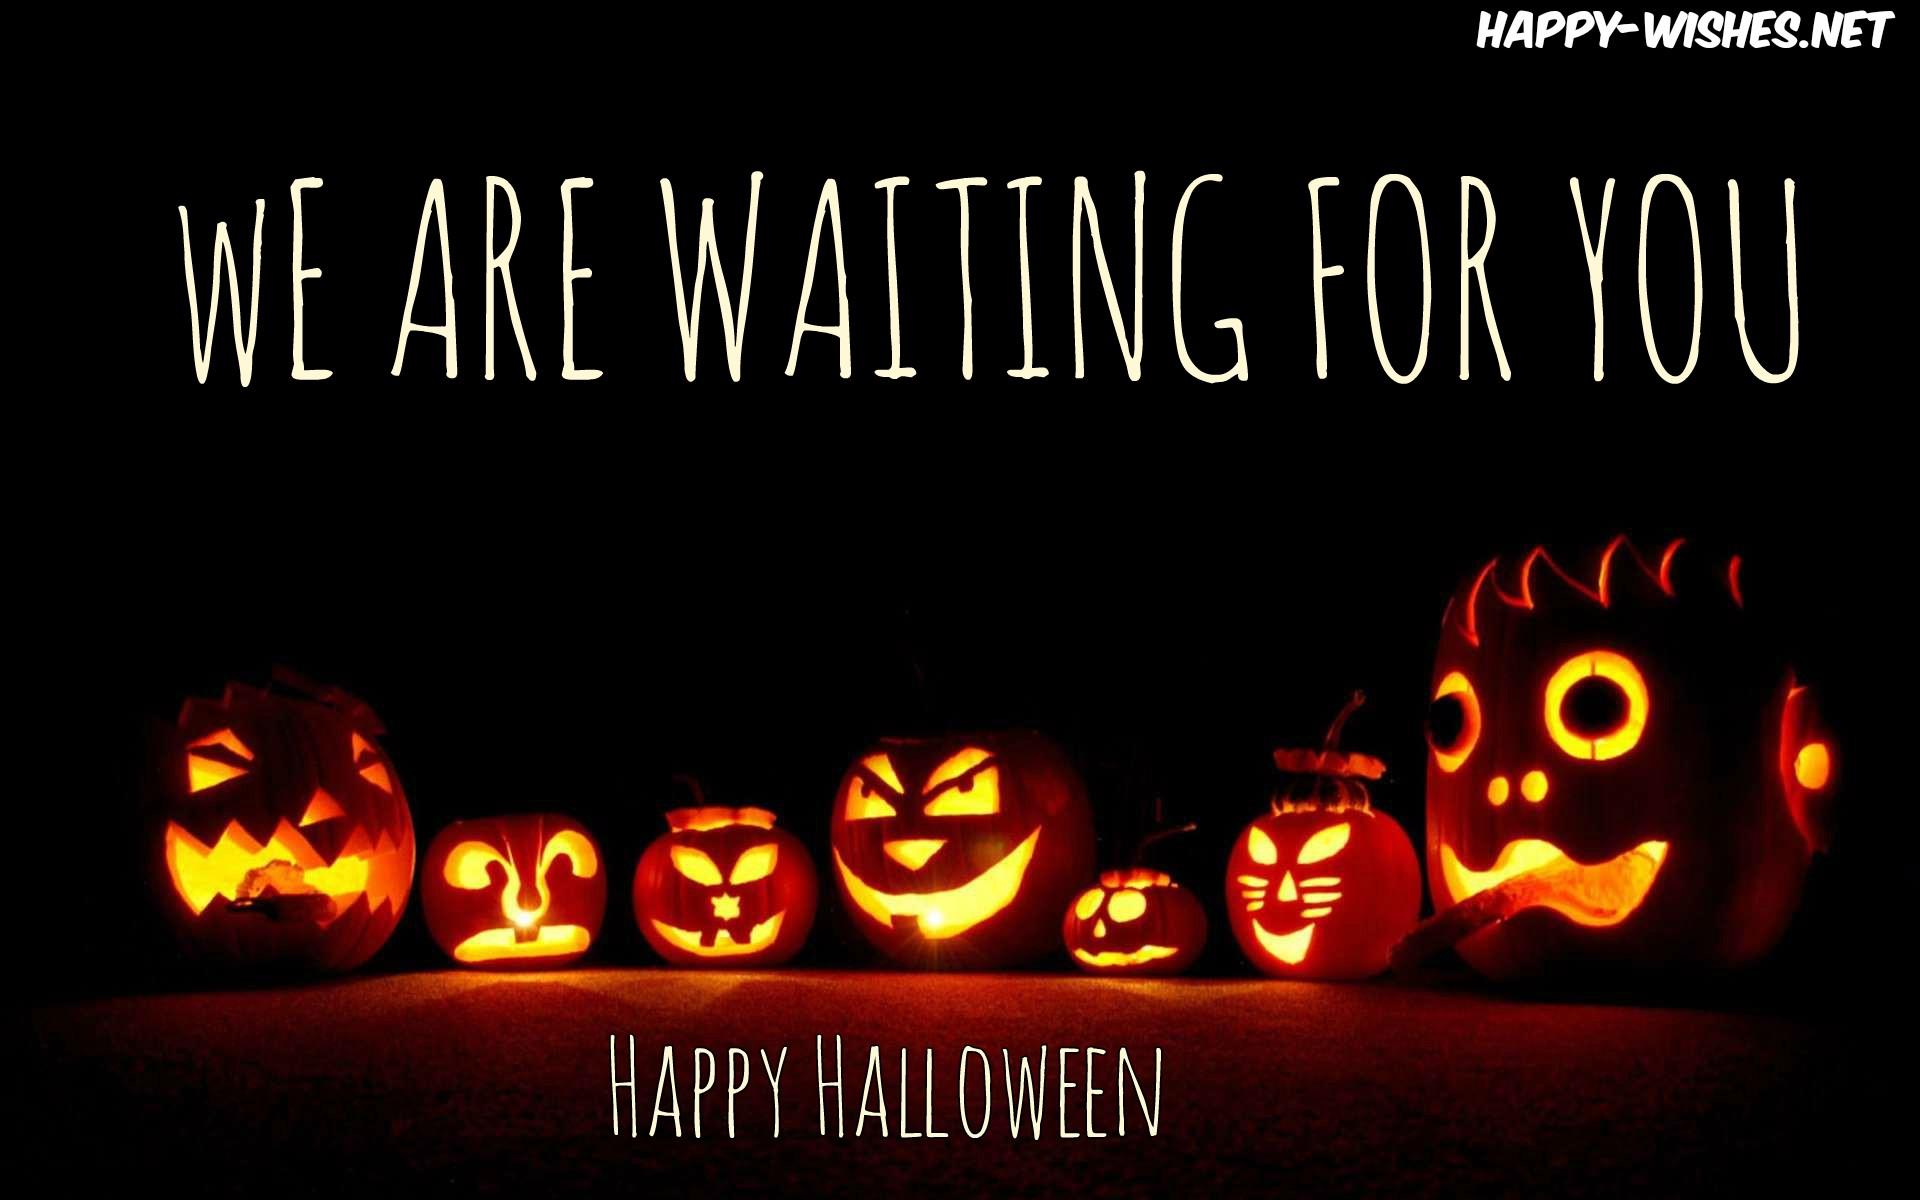 Laughing Jack o lanterns images on Halloween